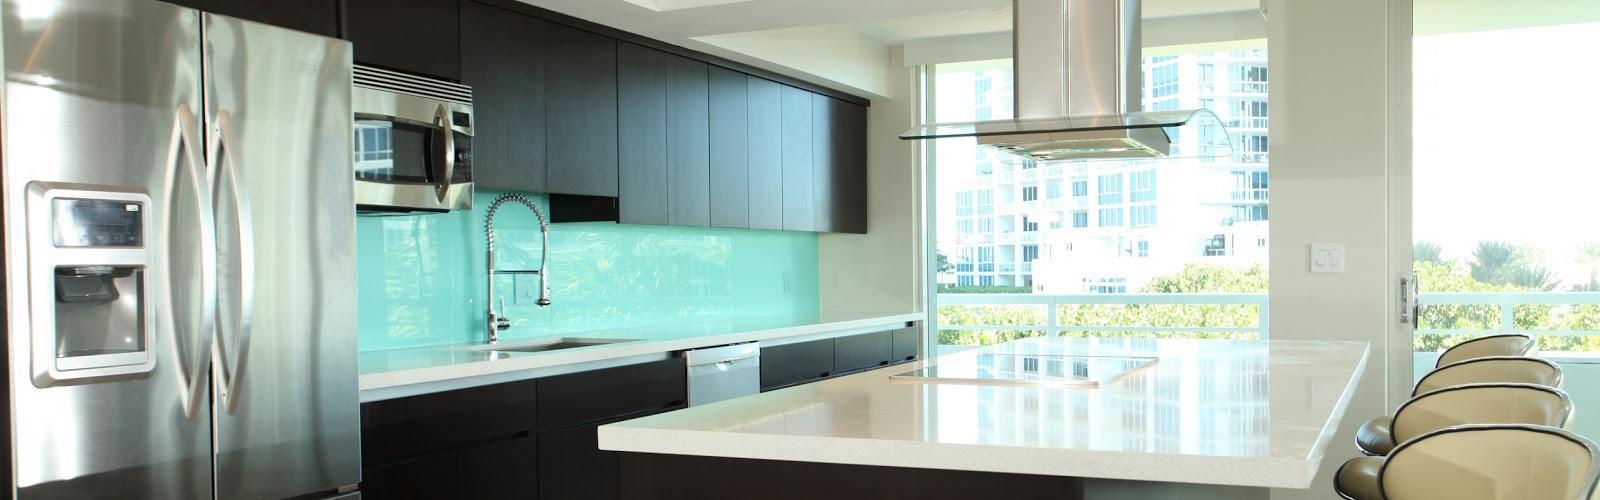 Glass Splash Backs | Glass Worktops Hampshire | Home